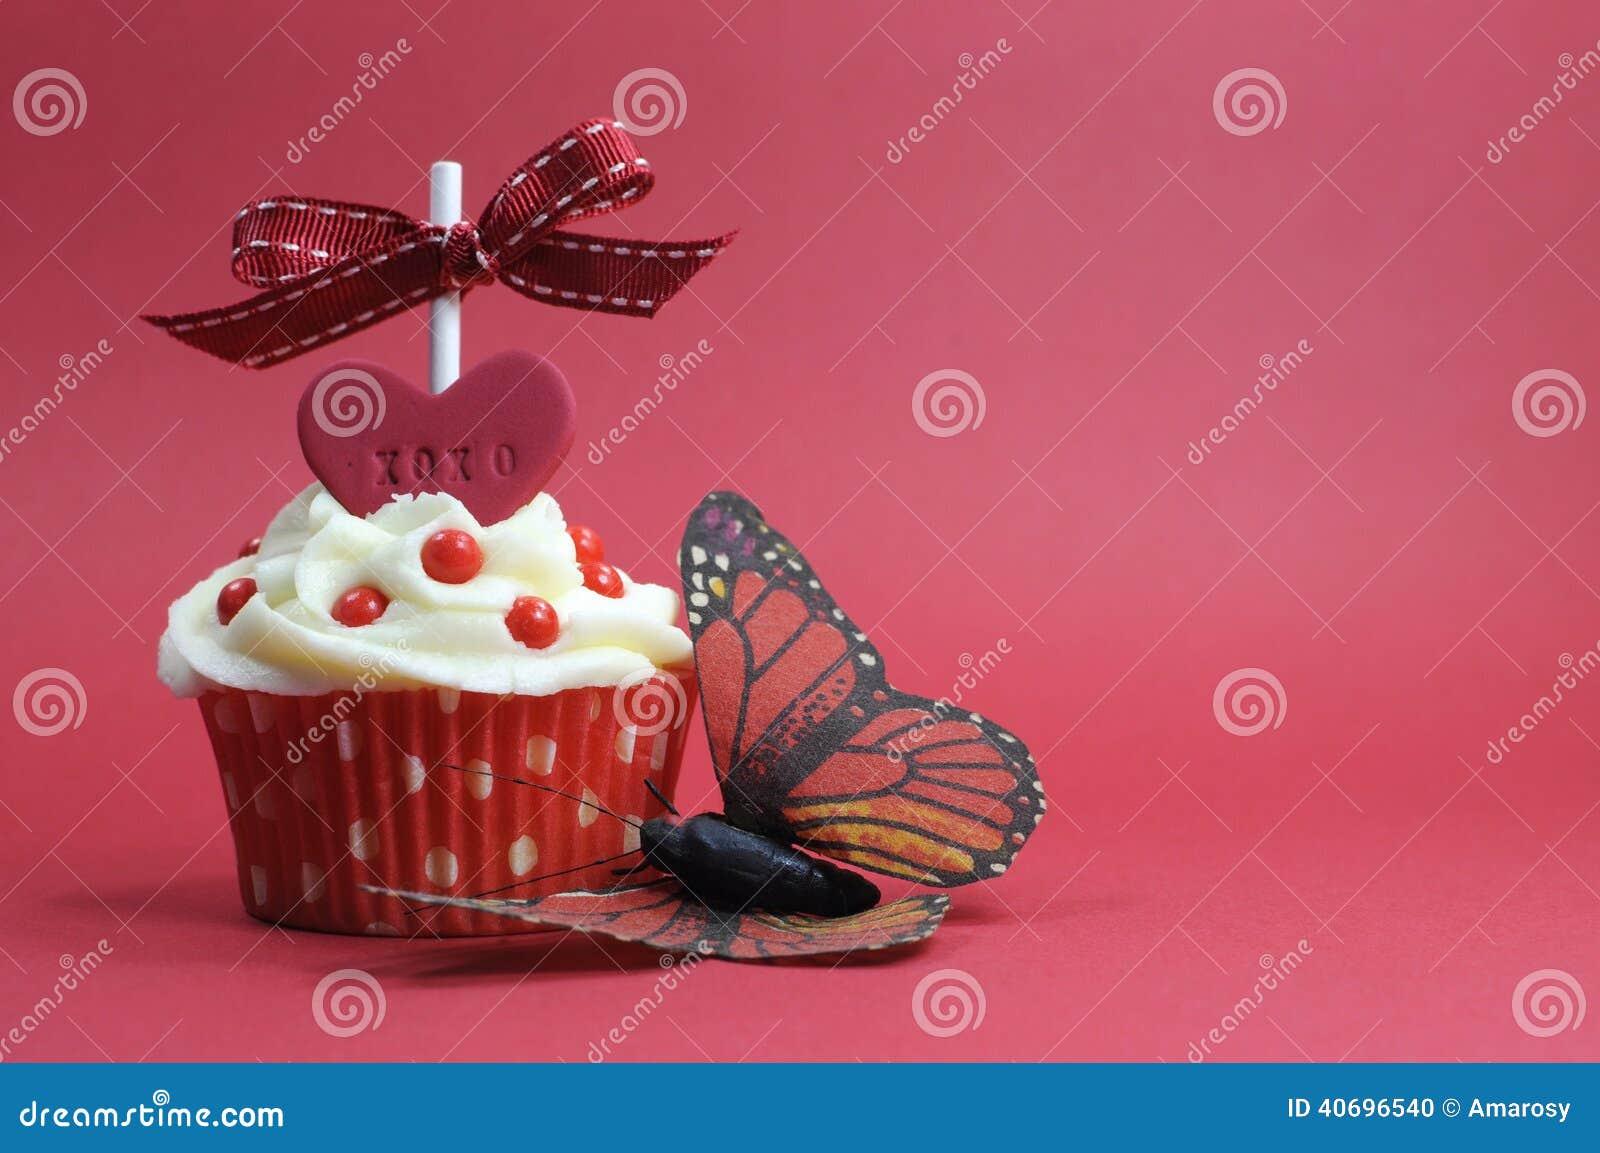 february cupcakes wallpaper - photo #22